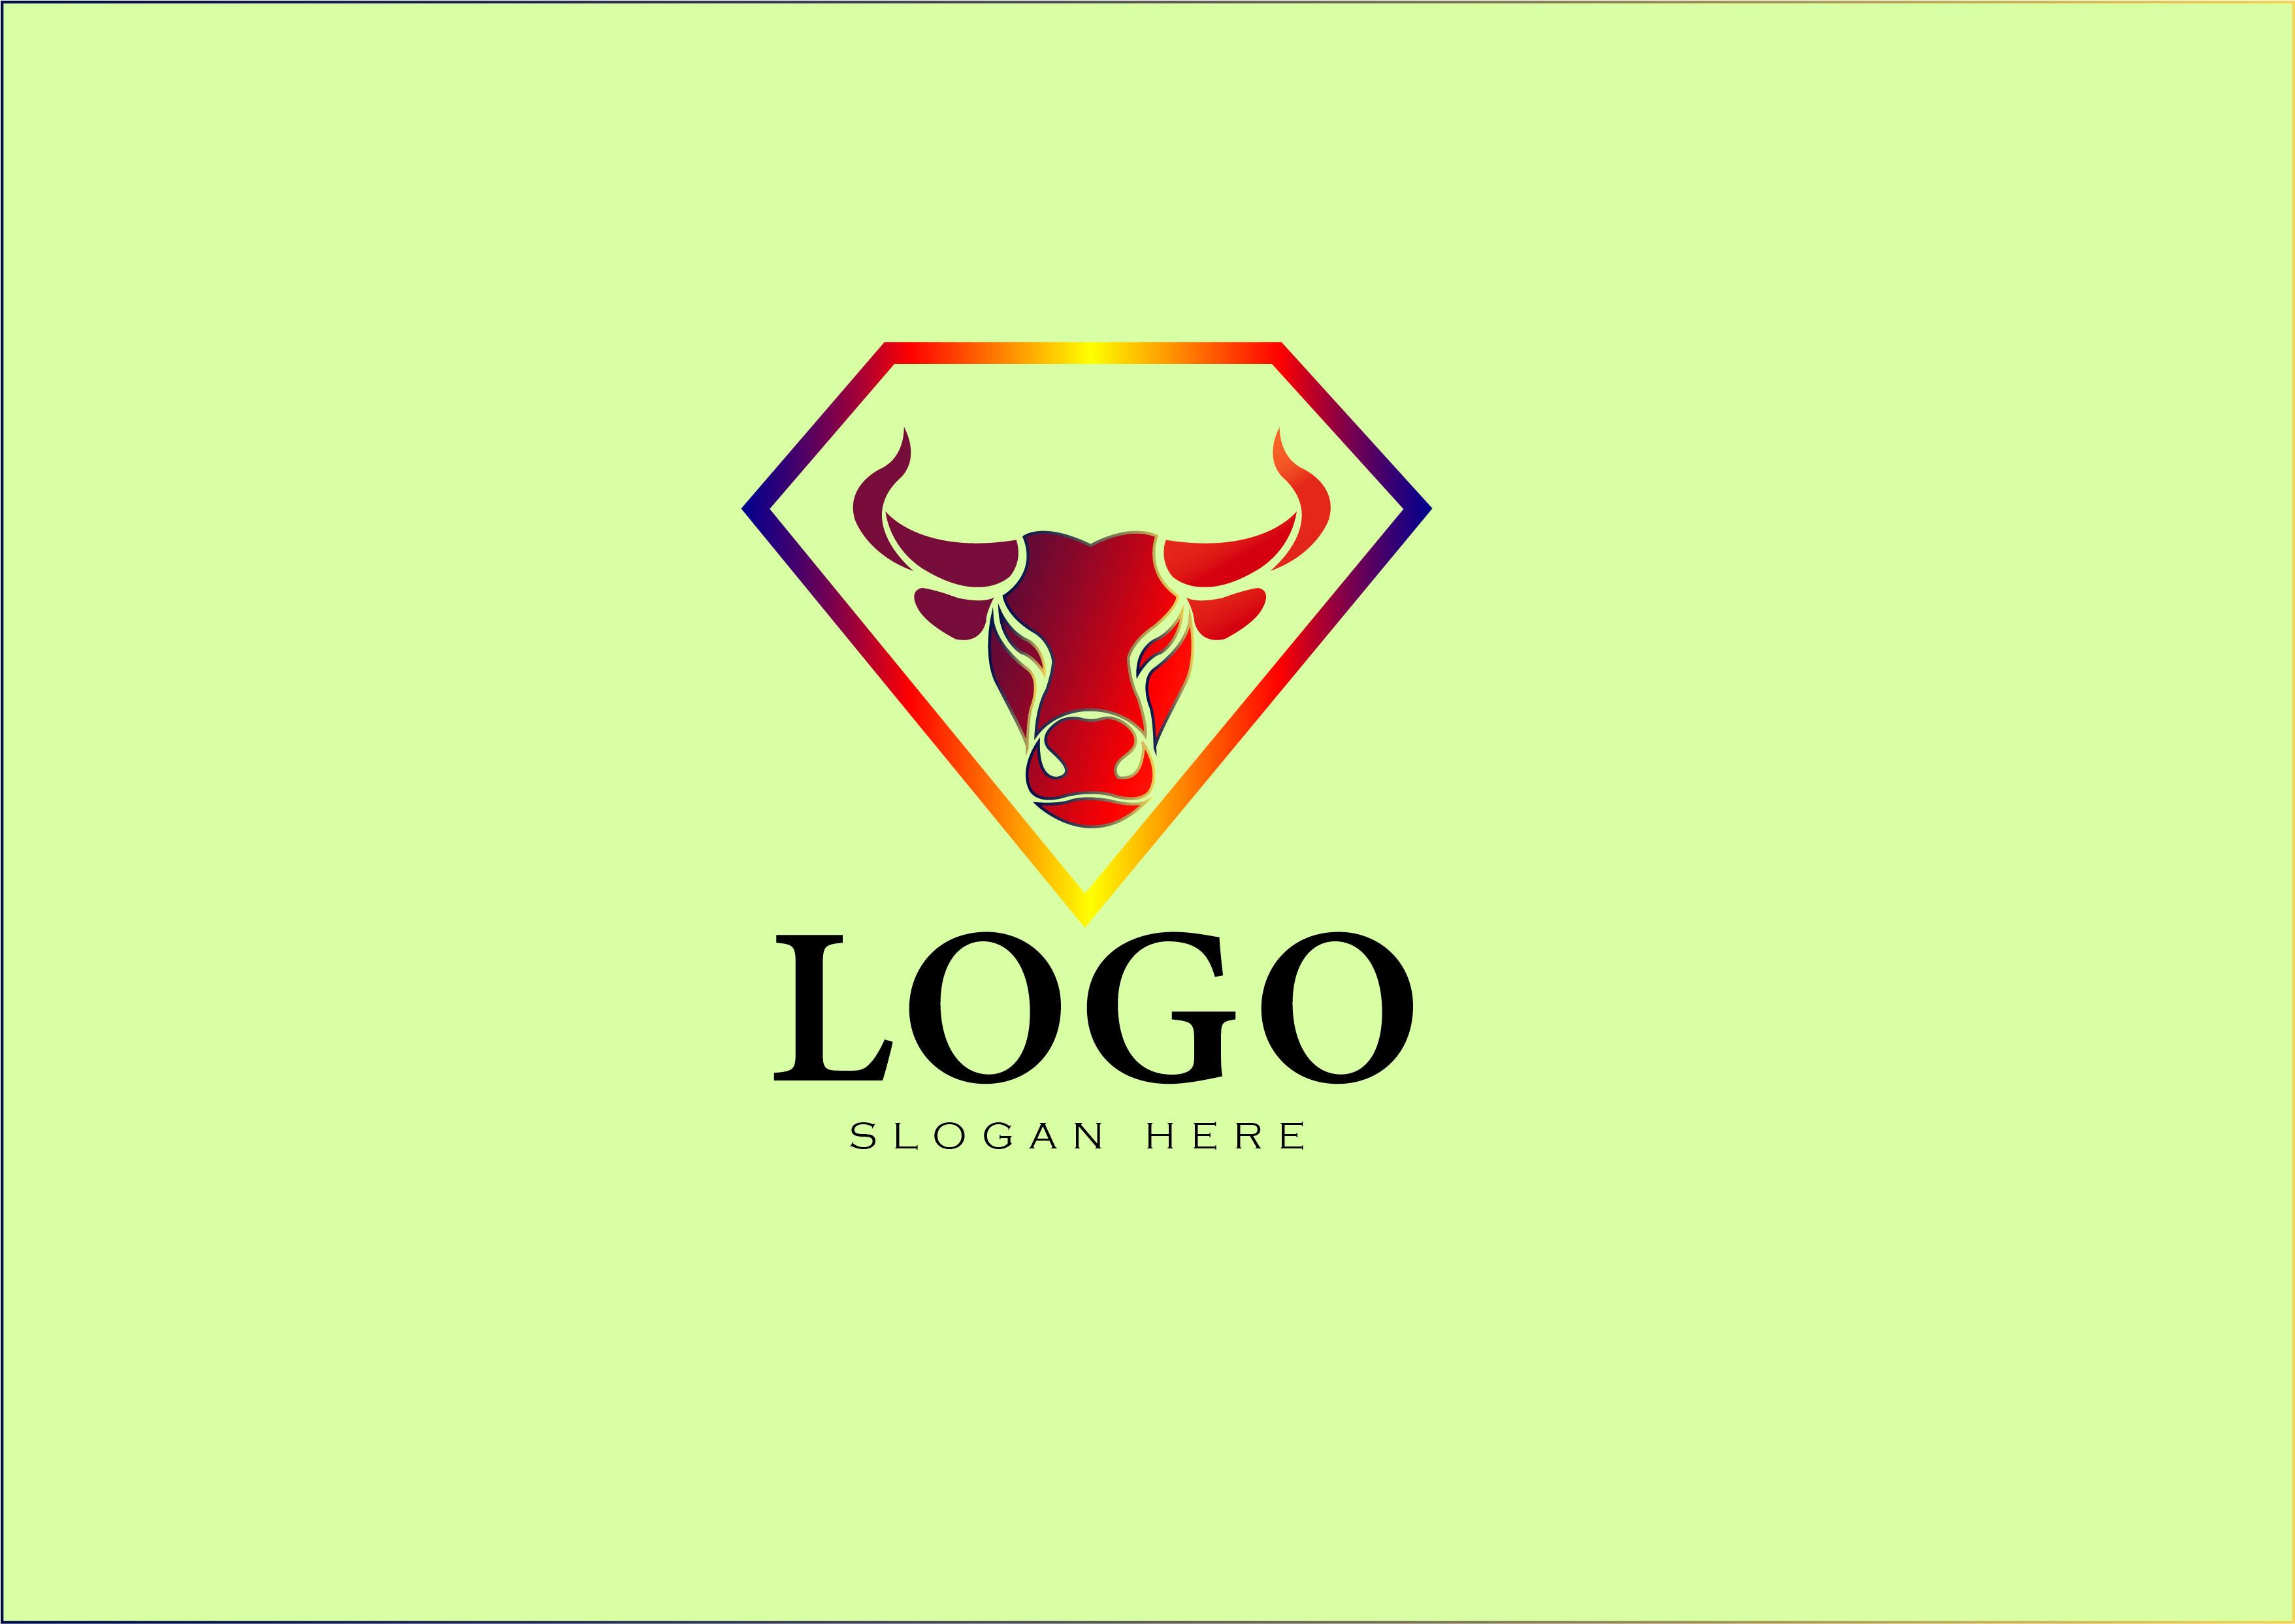 I will design 1 modern minimalist logo